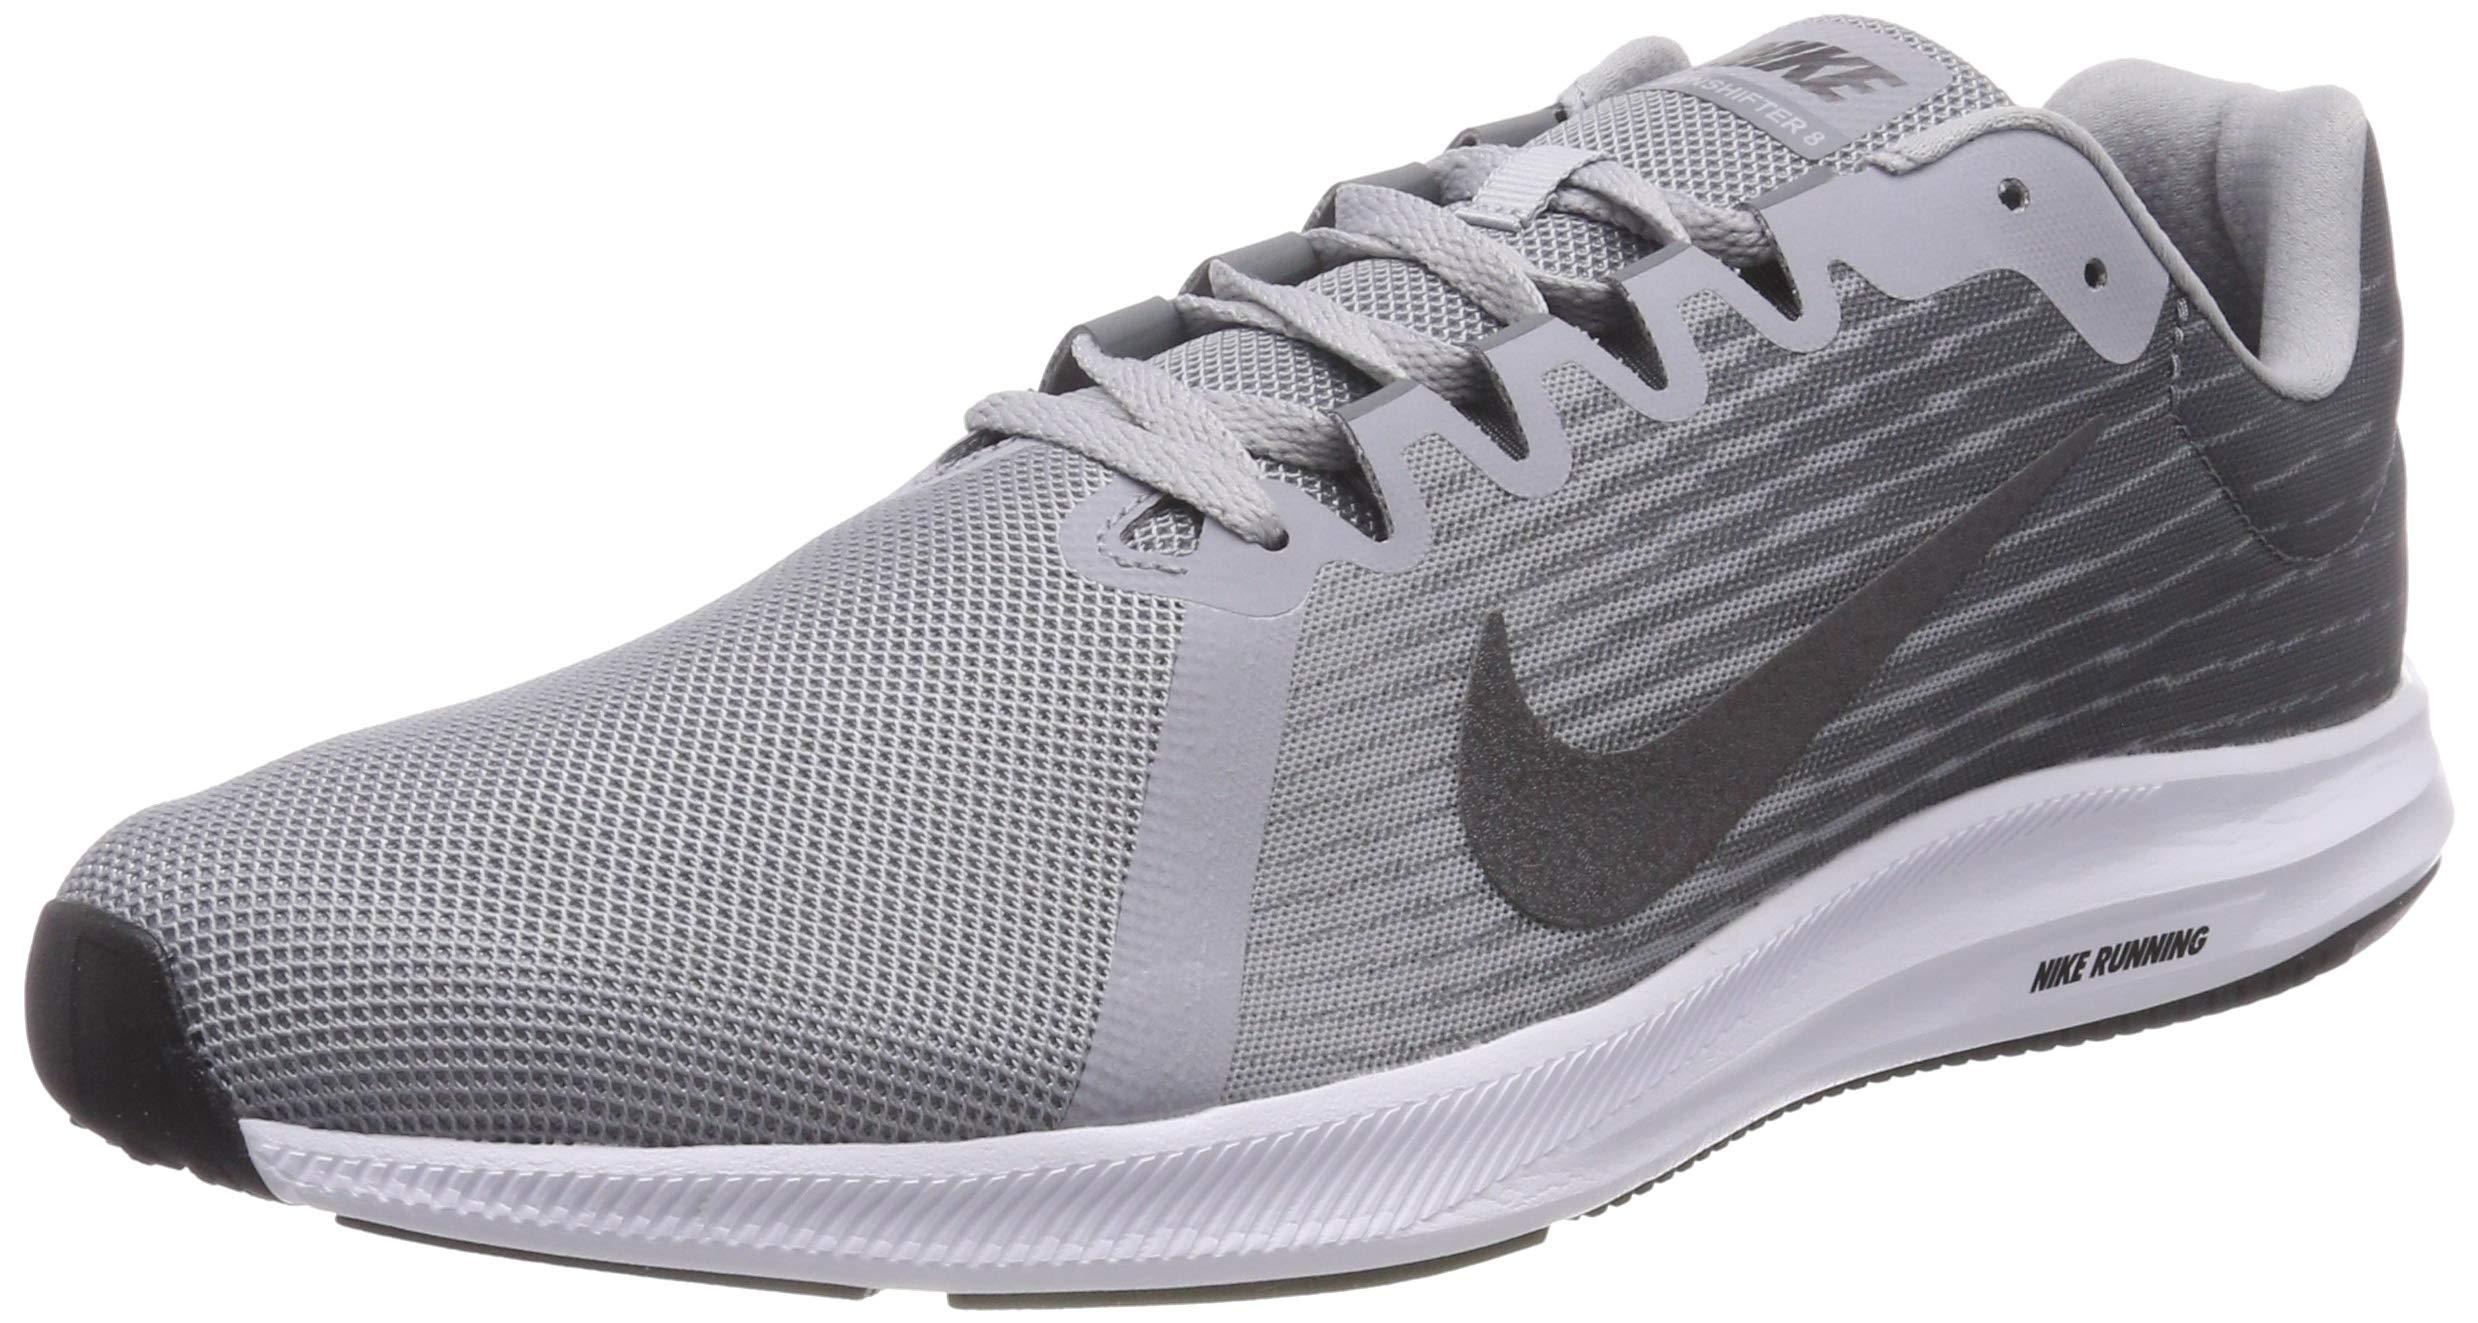 size 40 81c59 09bfa Galleon - Nike Men s Downshifter 8 Running Shoe, Wolf Metallic Dark Cool  Grey, 9 Regular US